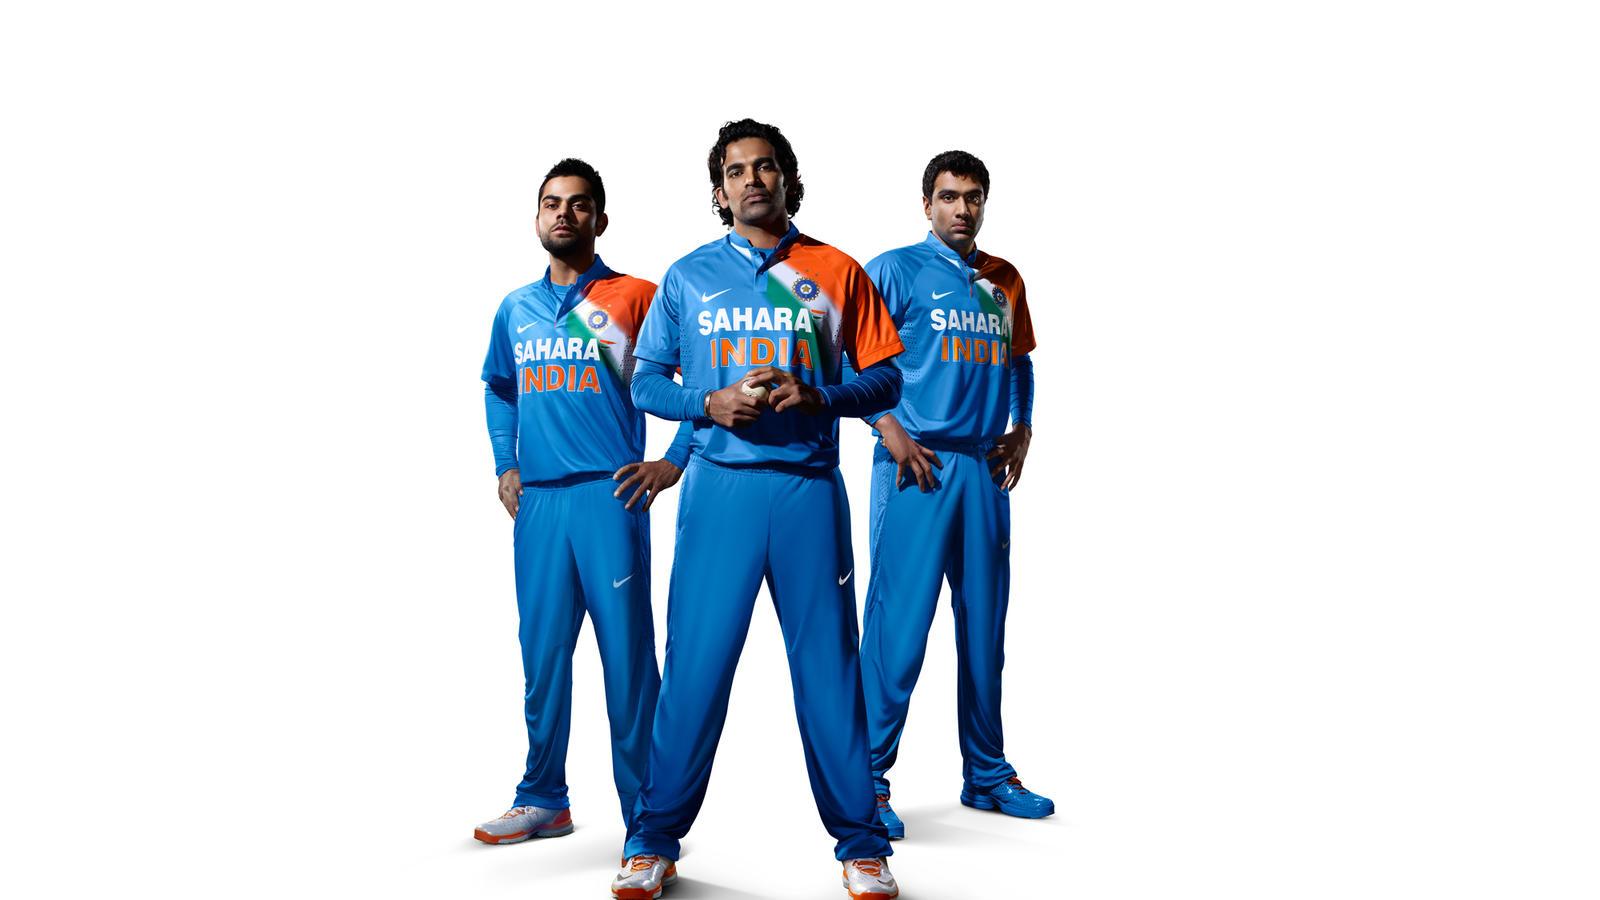 415227b99 Nike unveils innovative T20 cricket kit for Team India - Nike News